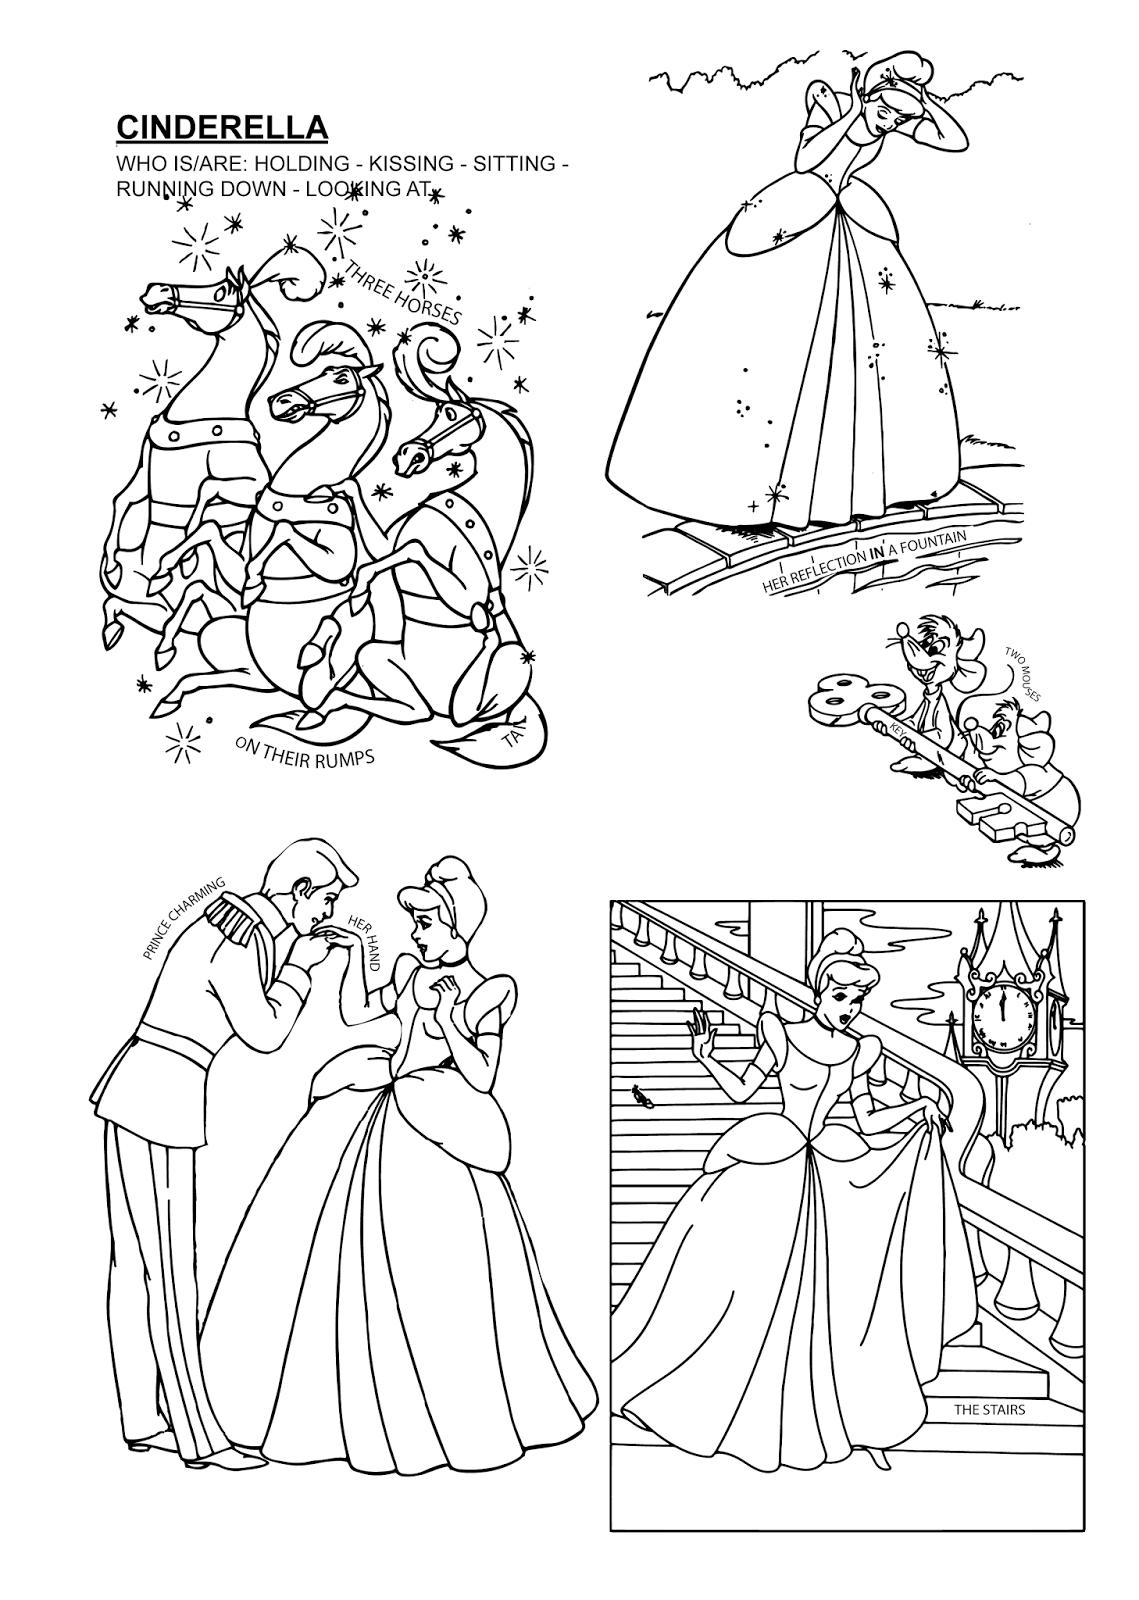 Cinderella Charming Kissing Prince And 12